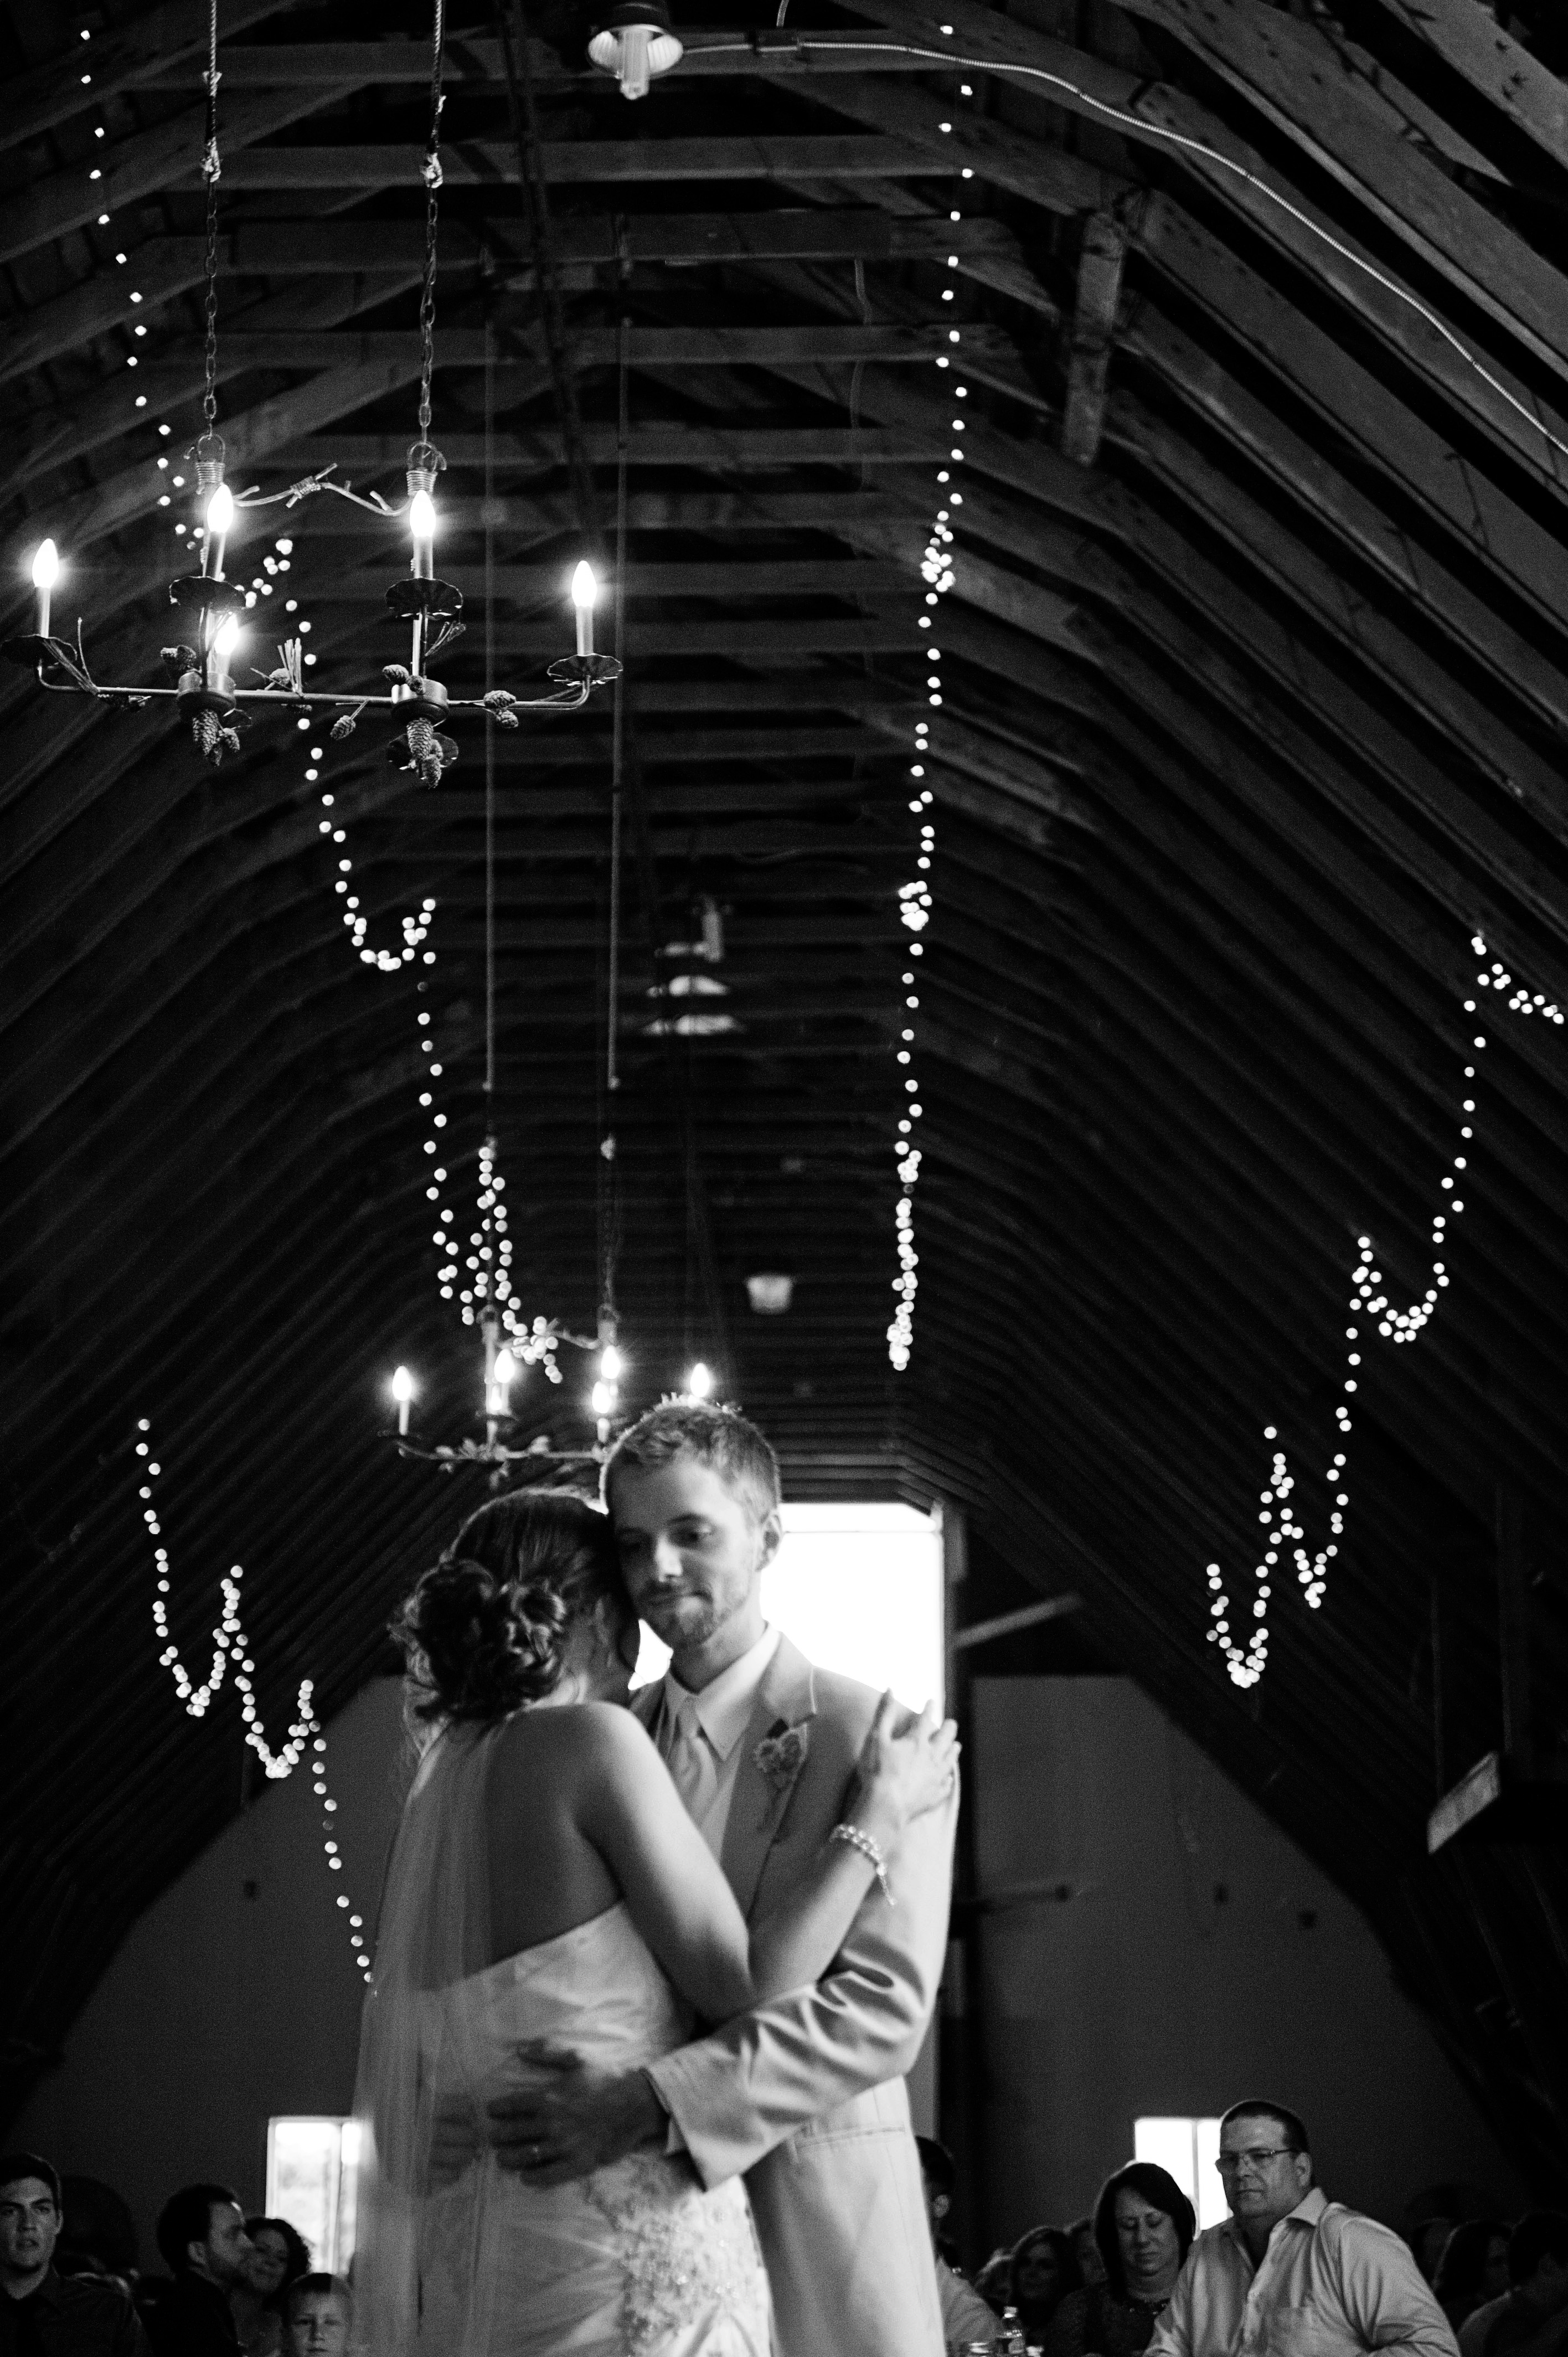 Rayandlauramarriage Country Wedding Reception 1256